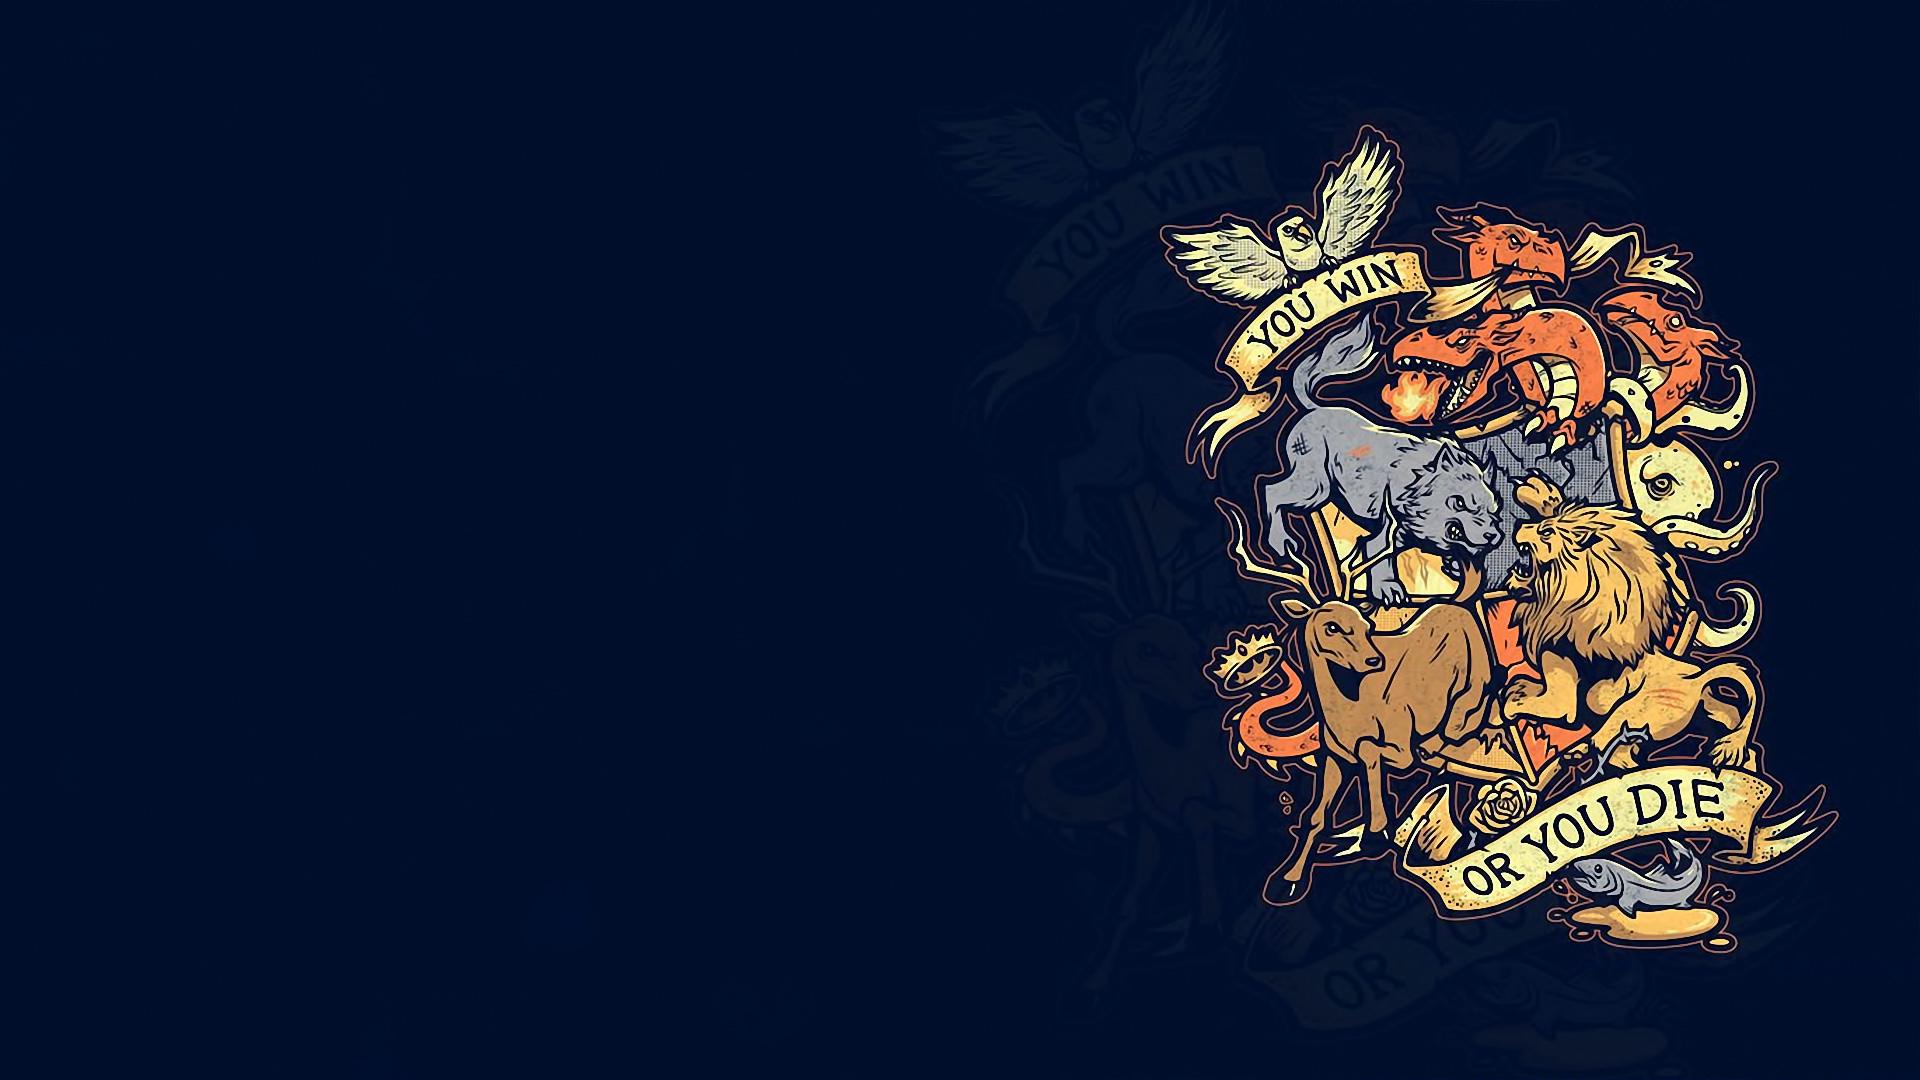 Game of Thrones fantasy crest g wallpaper background 1920x1080